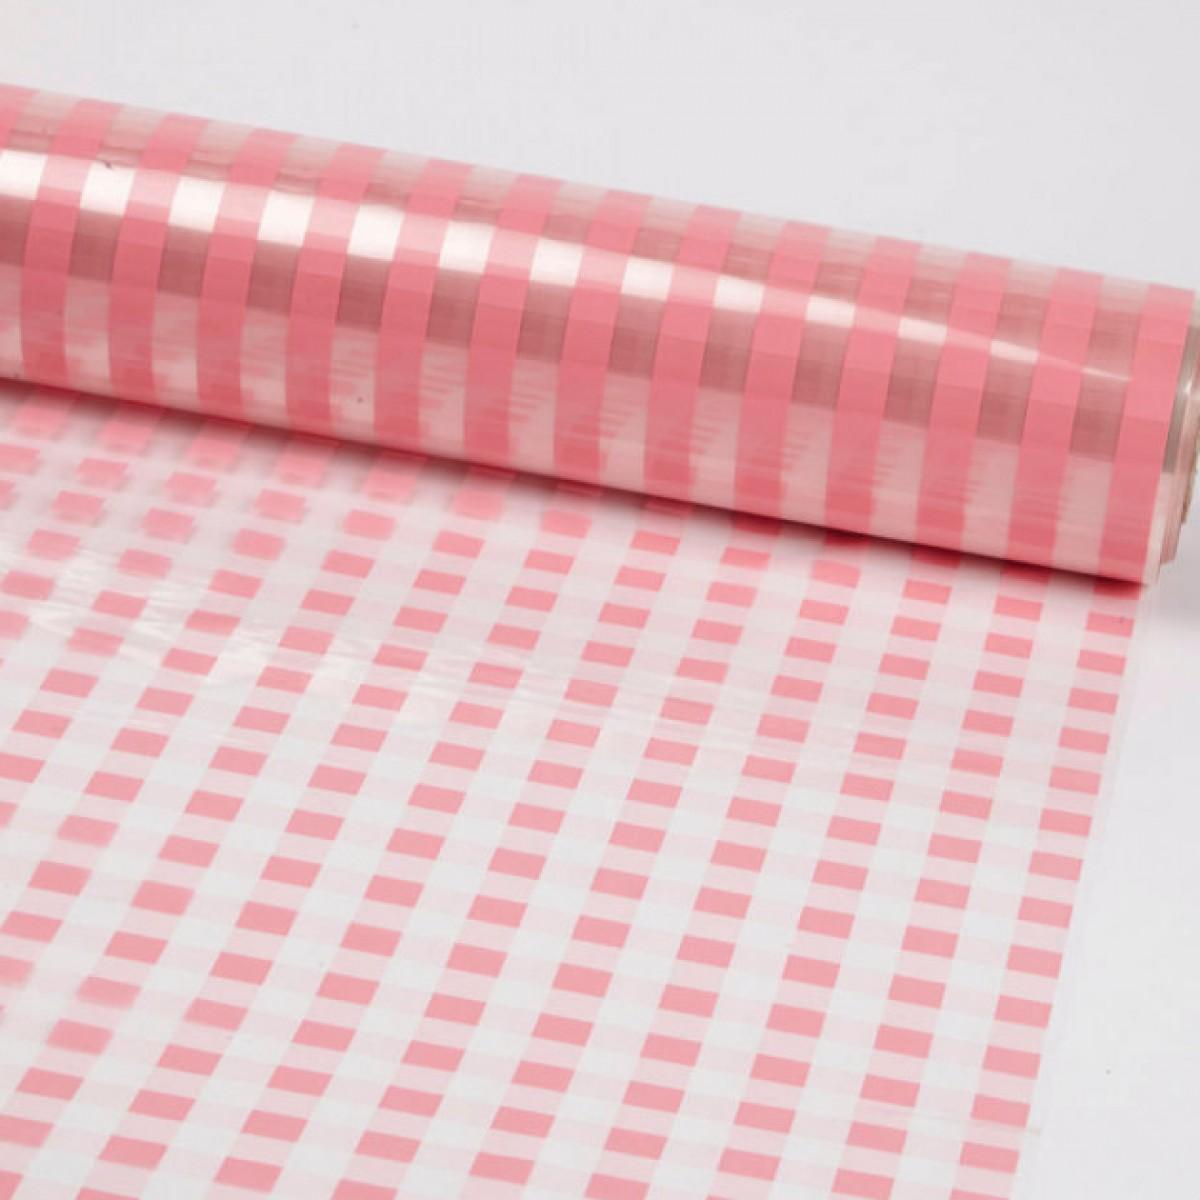 7007 Chex Pink 80cmx25m 50mic Film - 1 Roll